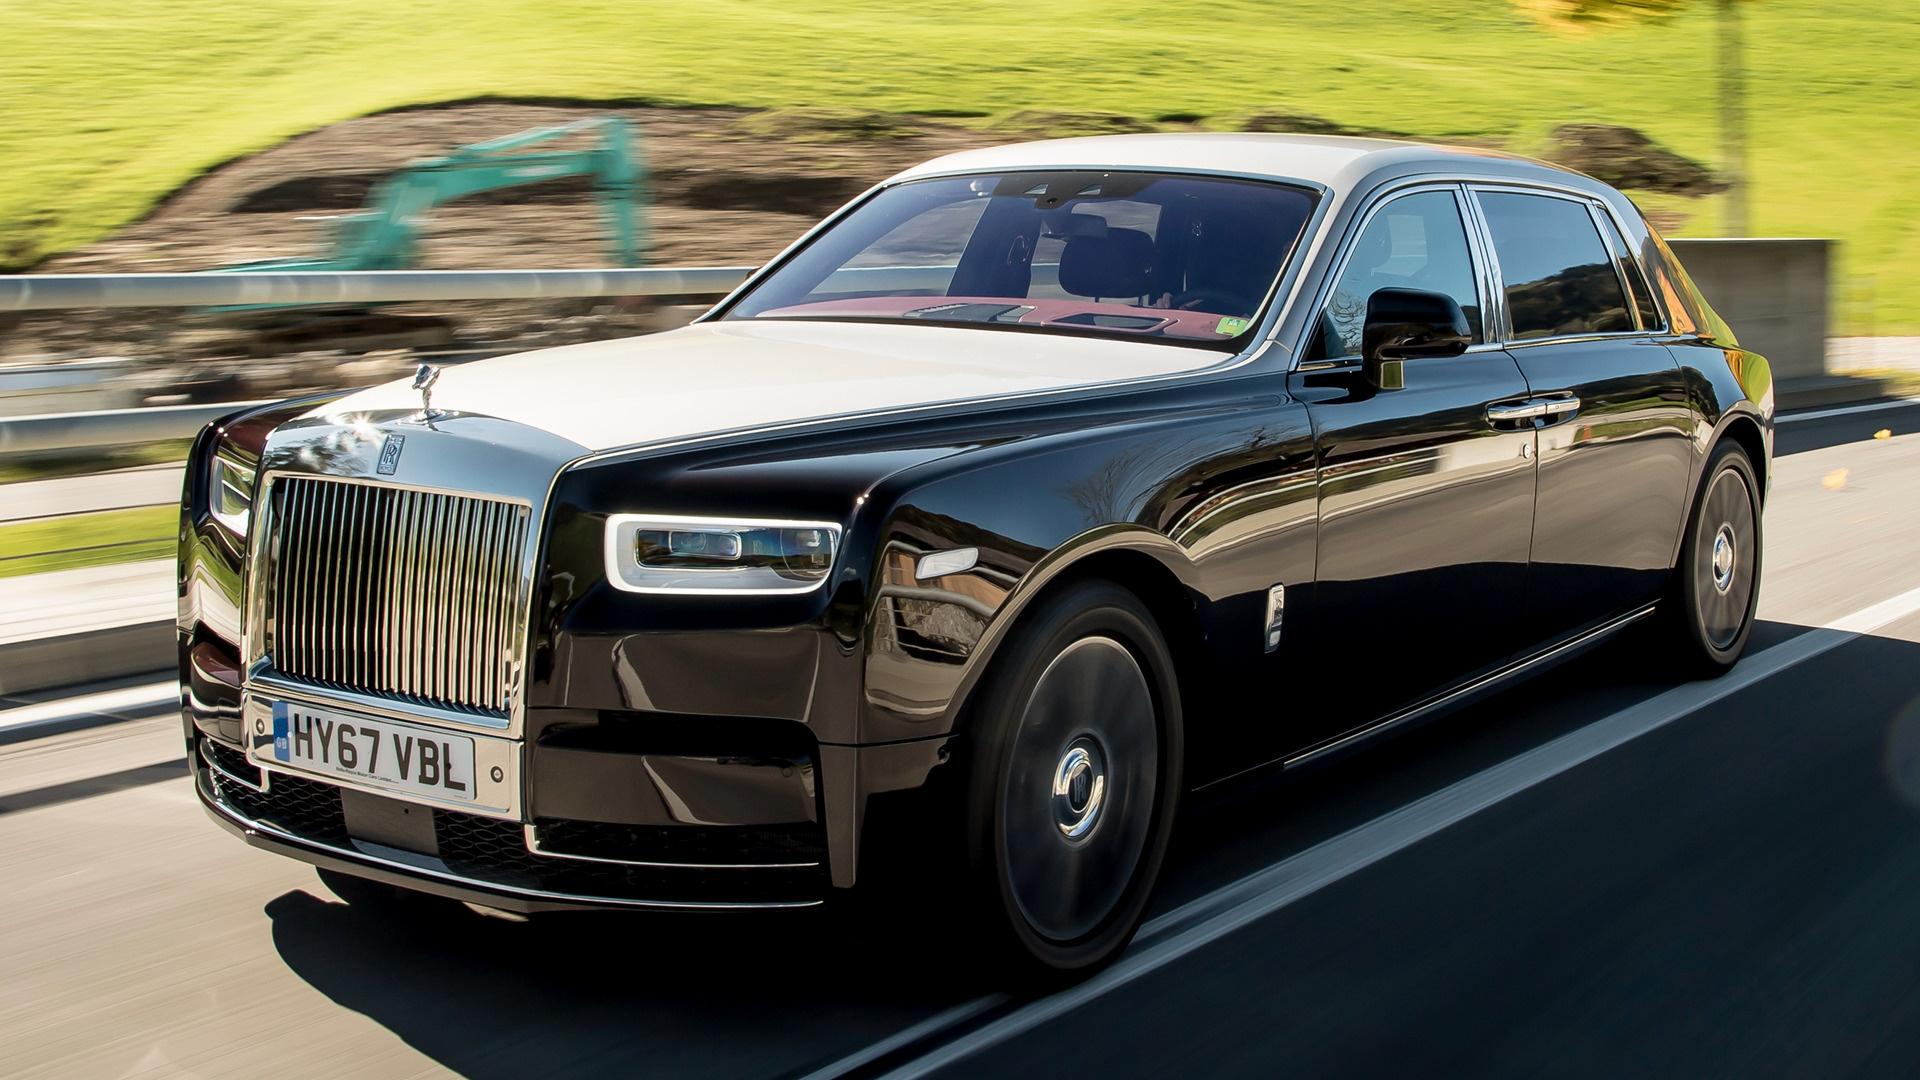 Rolls Royce Phantom Ewb 2017 Wallpapers And Hd Images Car Pixel